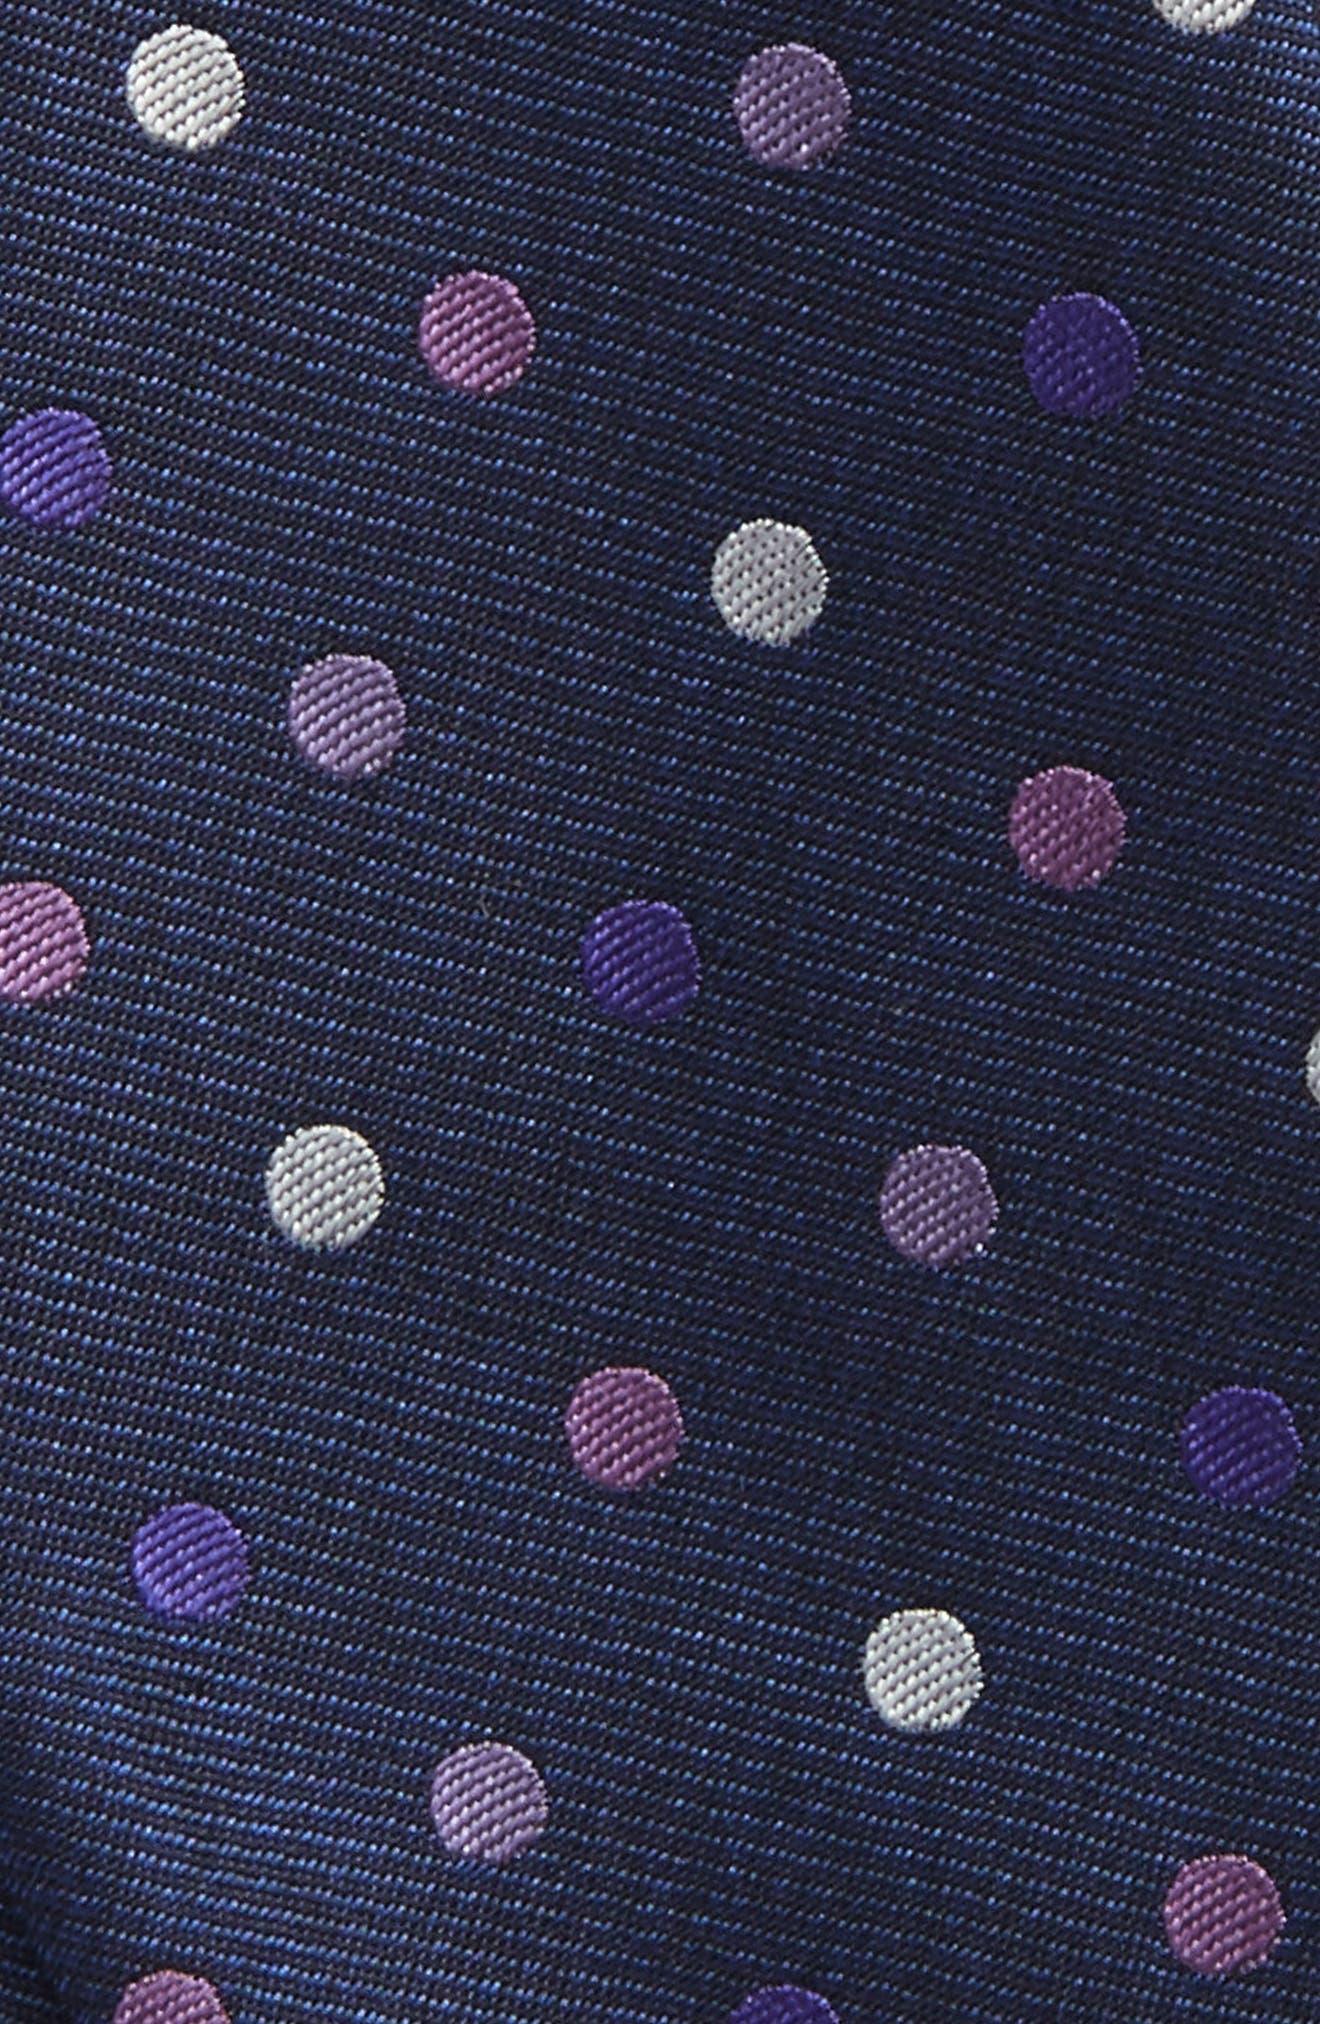 Alternate Image 3  - The Tie Bar Spree Dot Silk Bow Tie